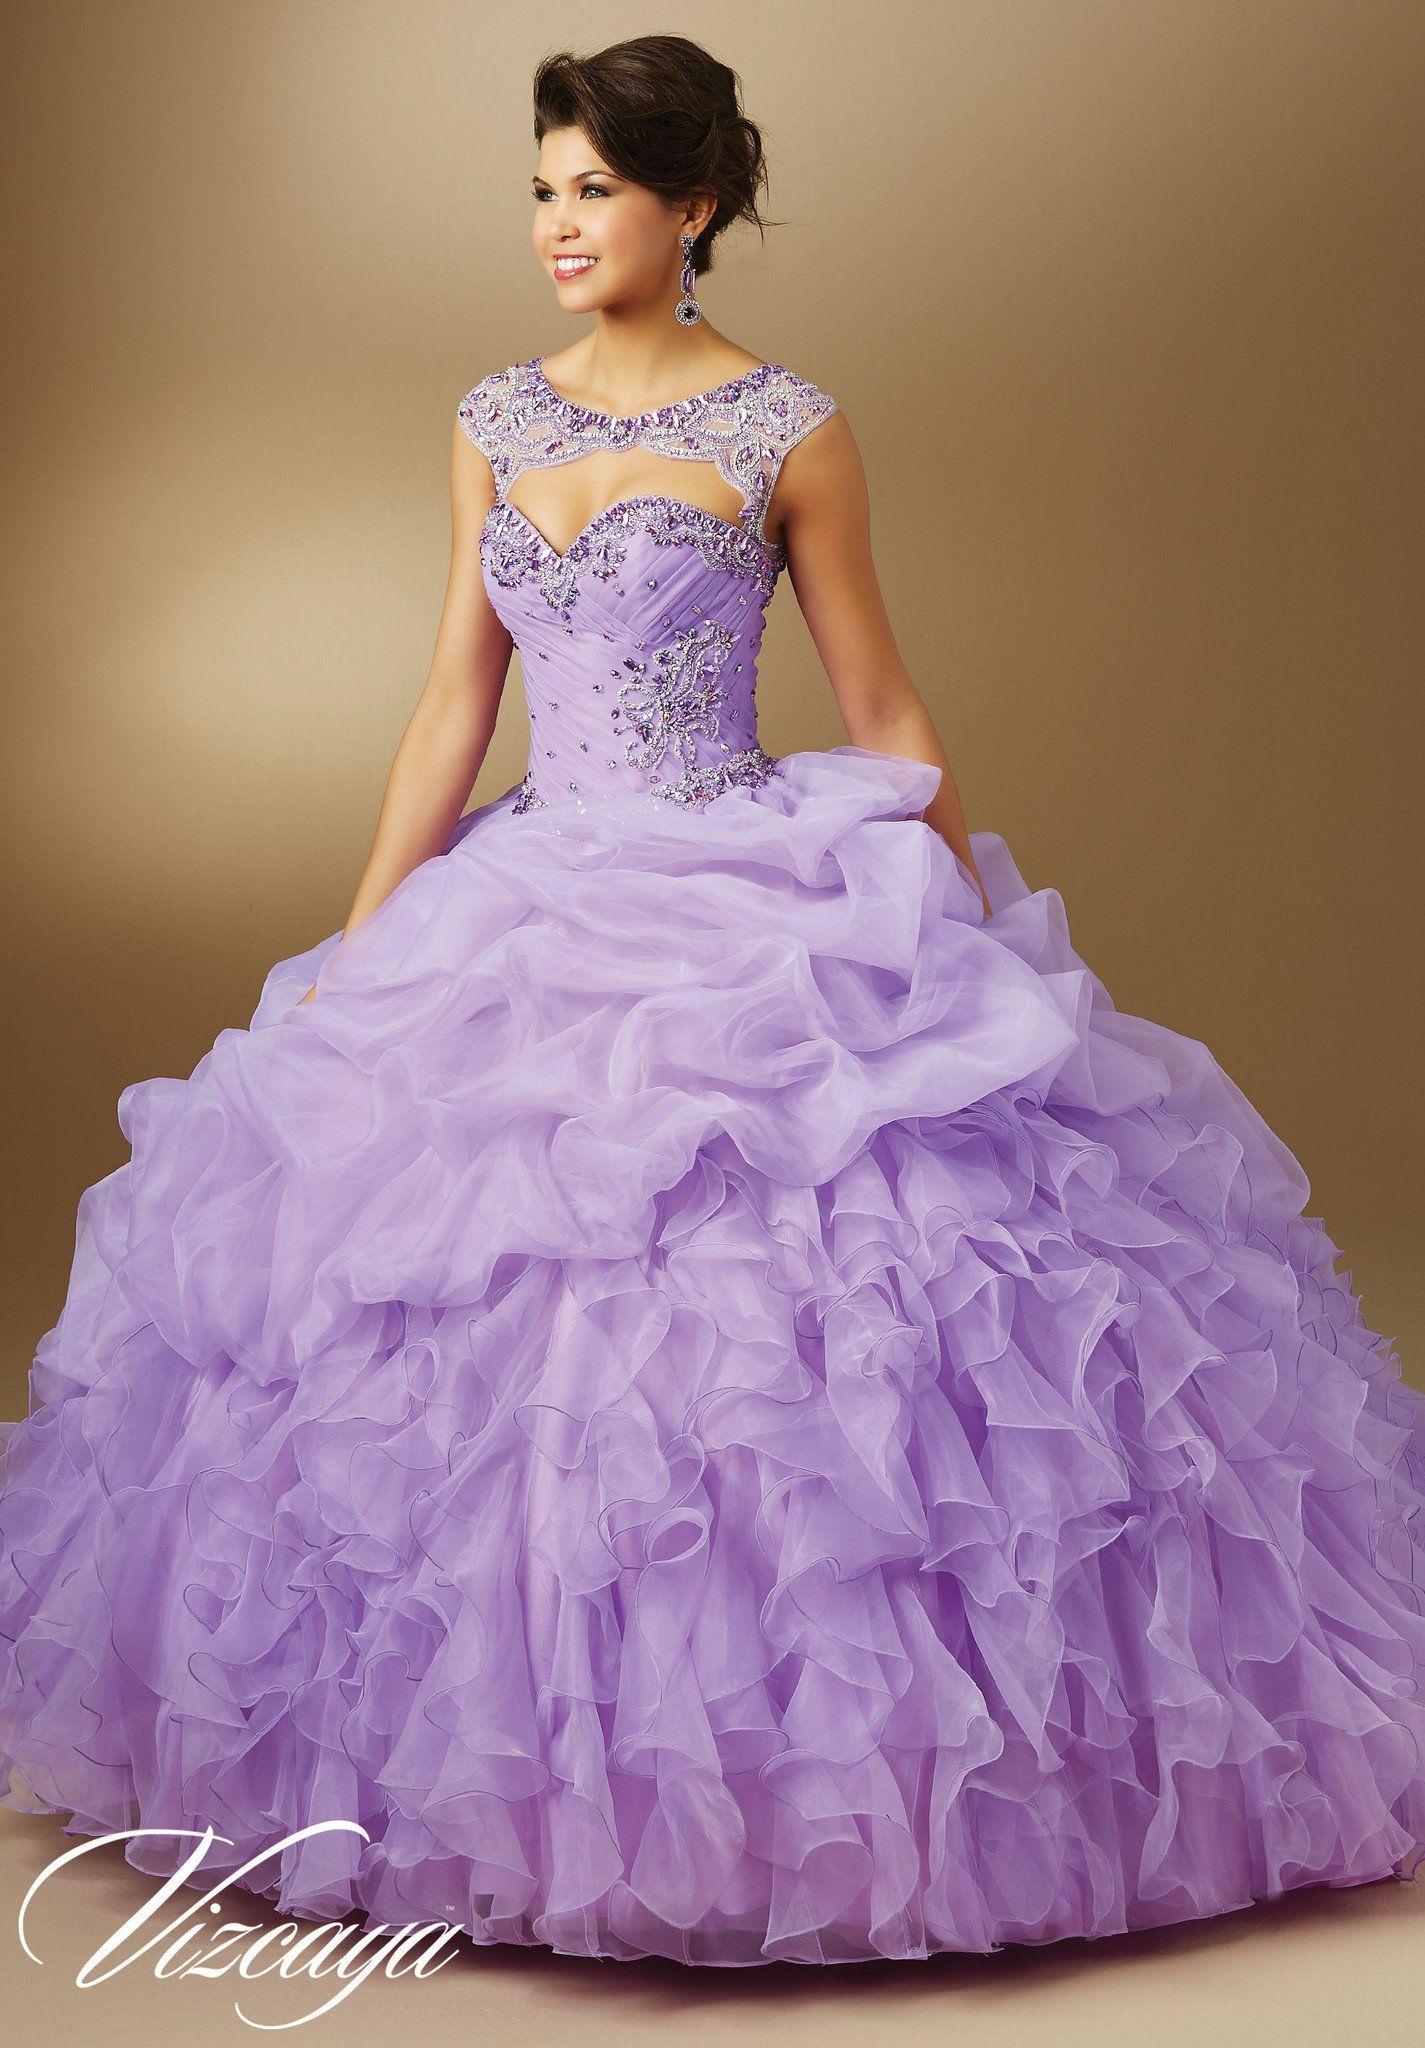 Vizcaya Lilac Dresses